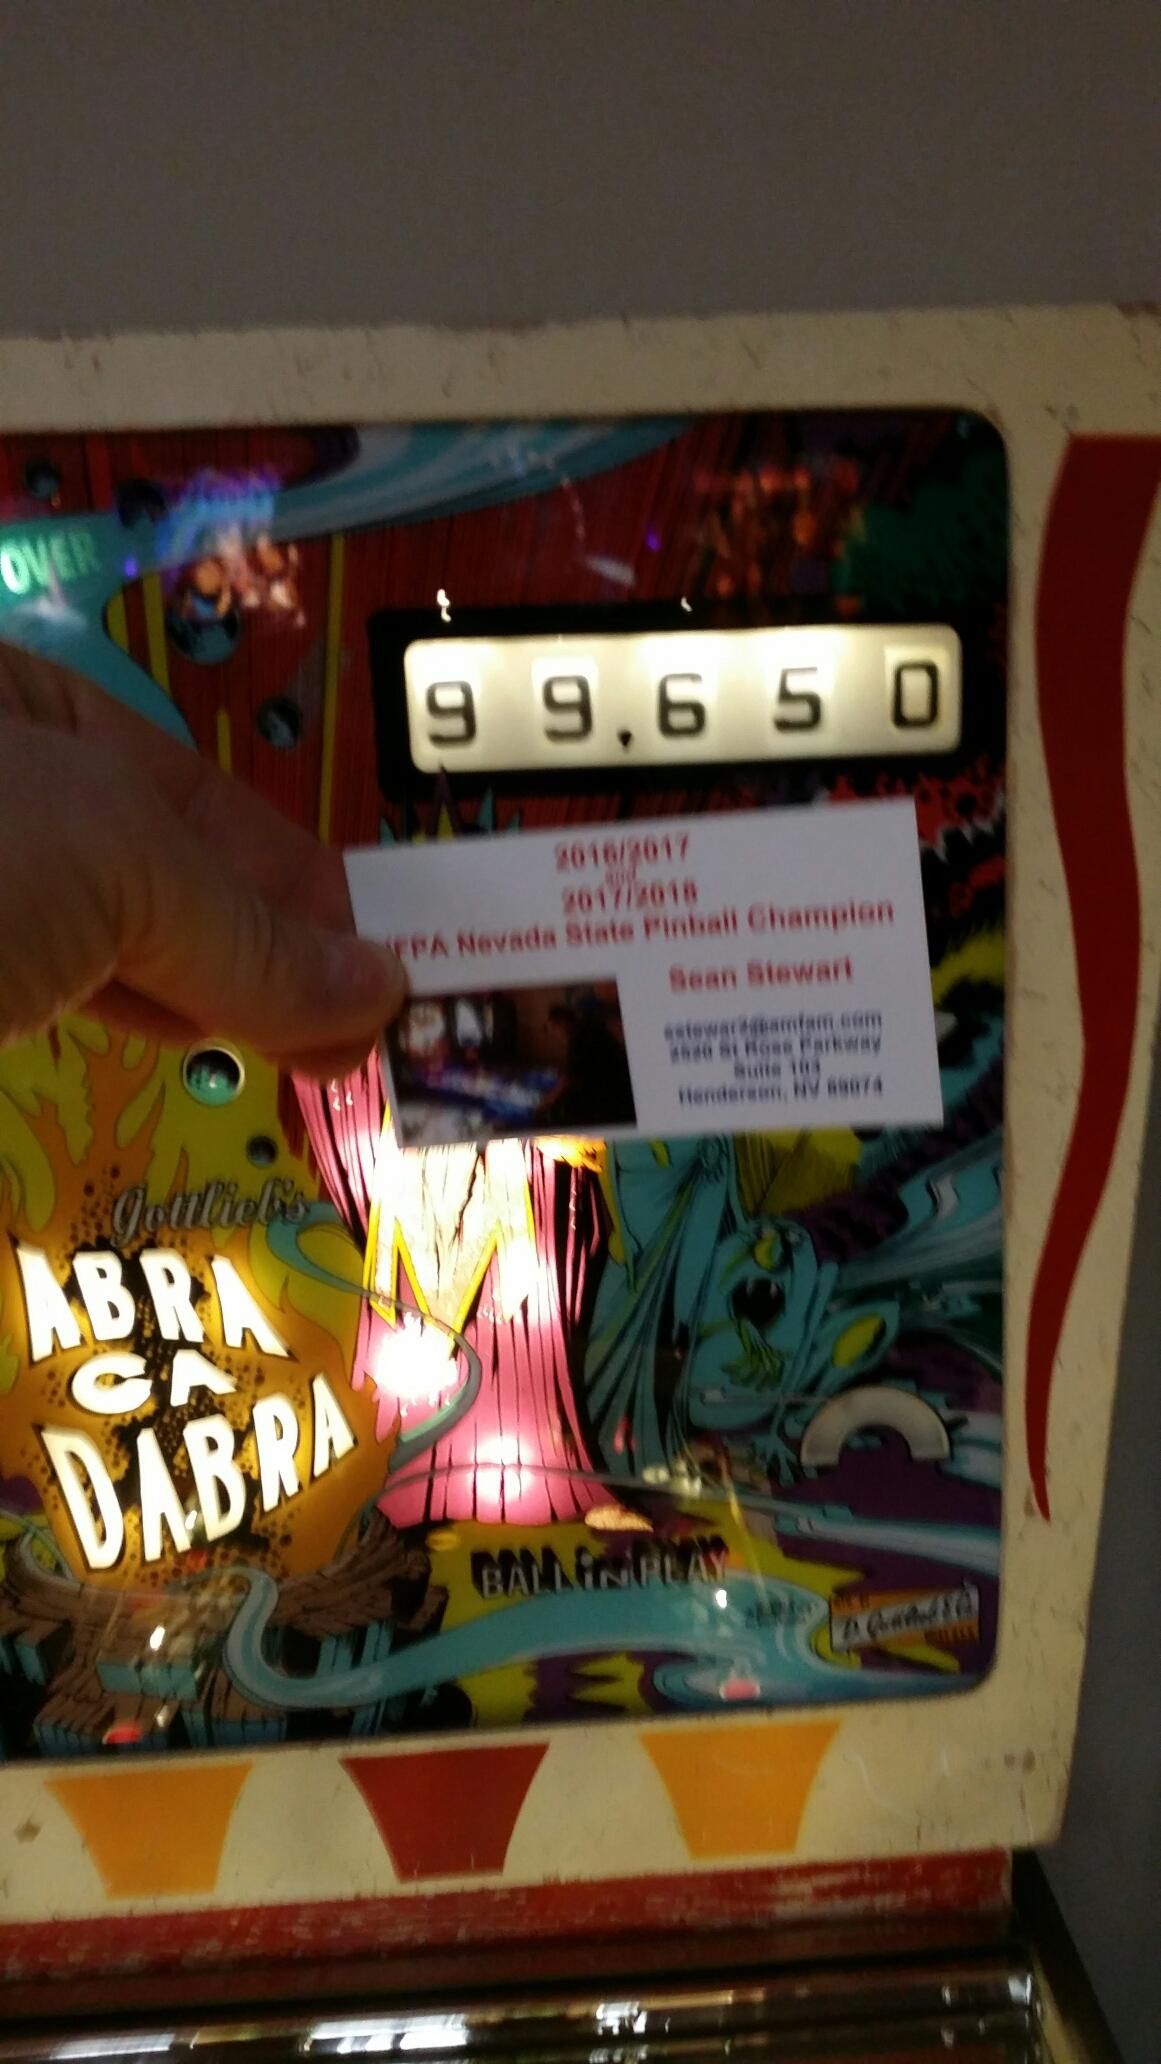 Abra Ca Dabra 99,650 points